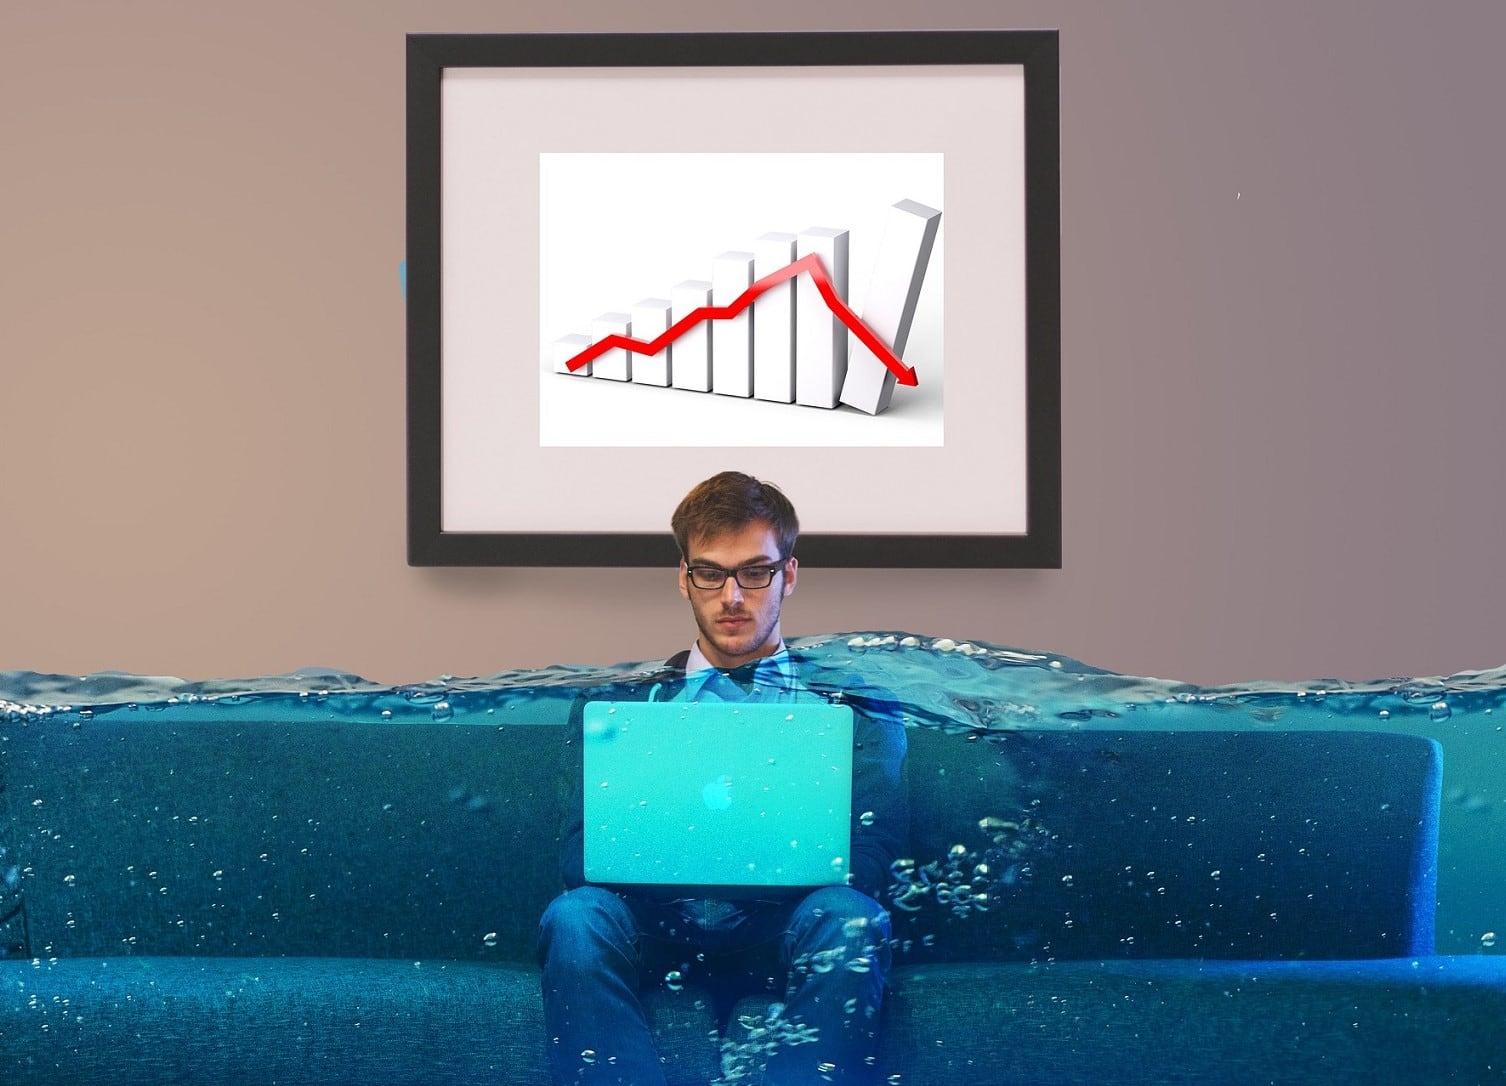 Las insolvencias de empresas a nivel mundial aumentarán un 26%